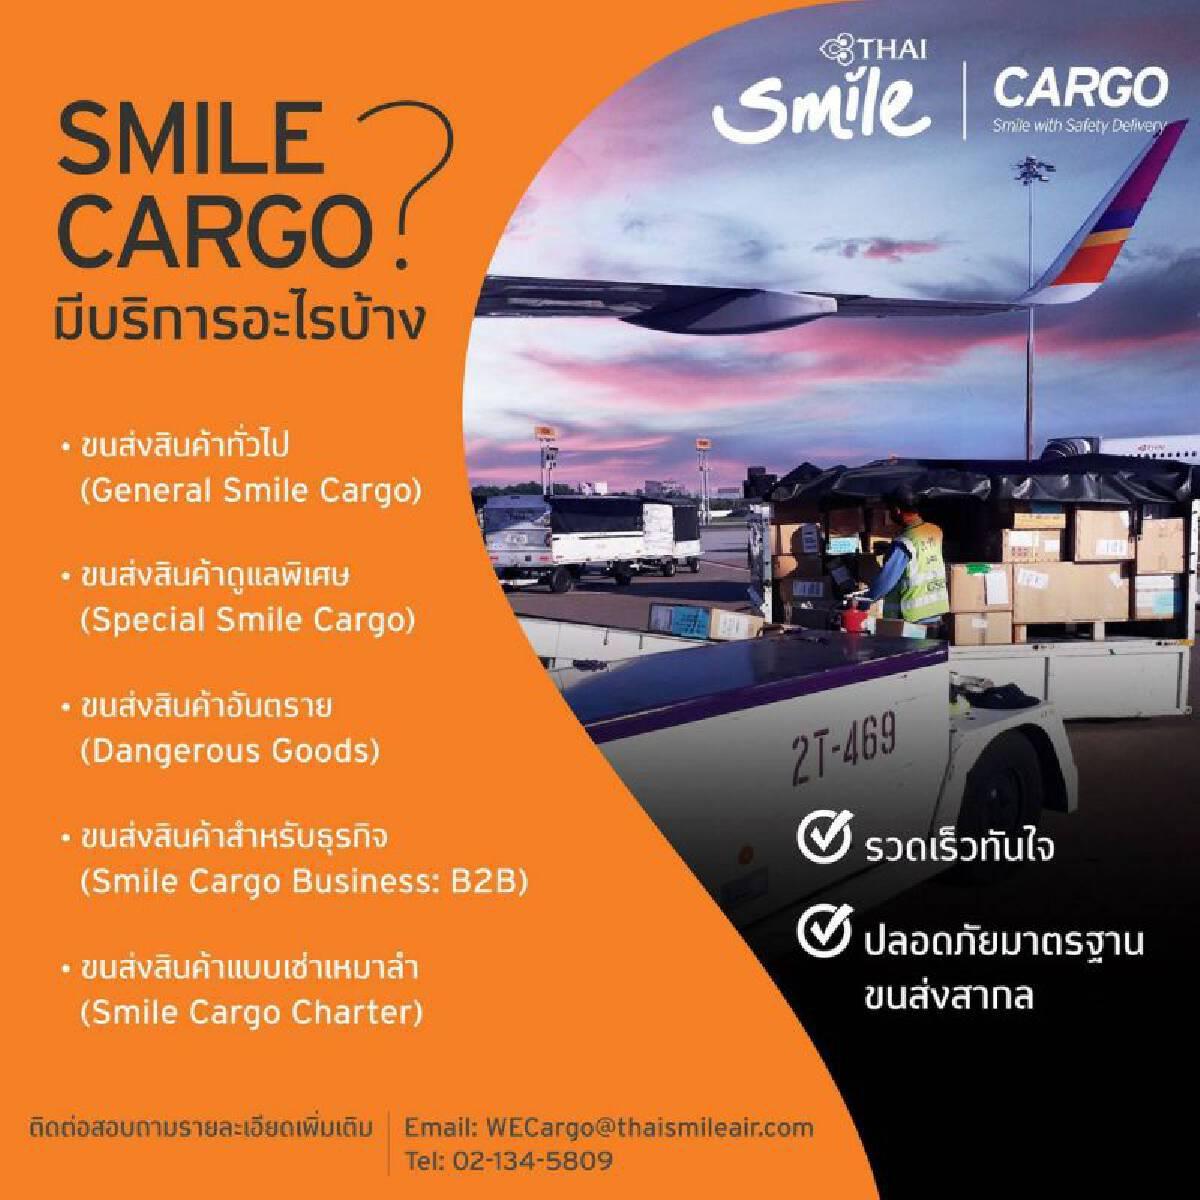 Smile Cargo